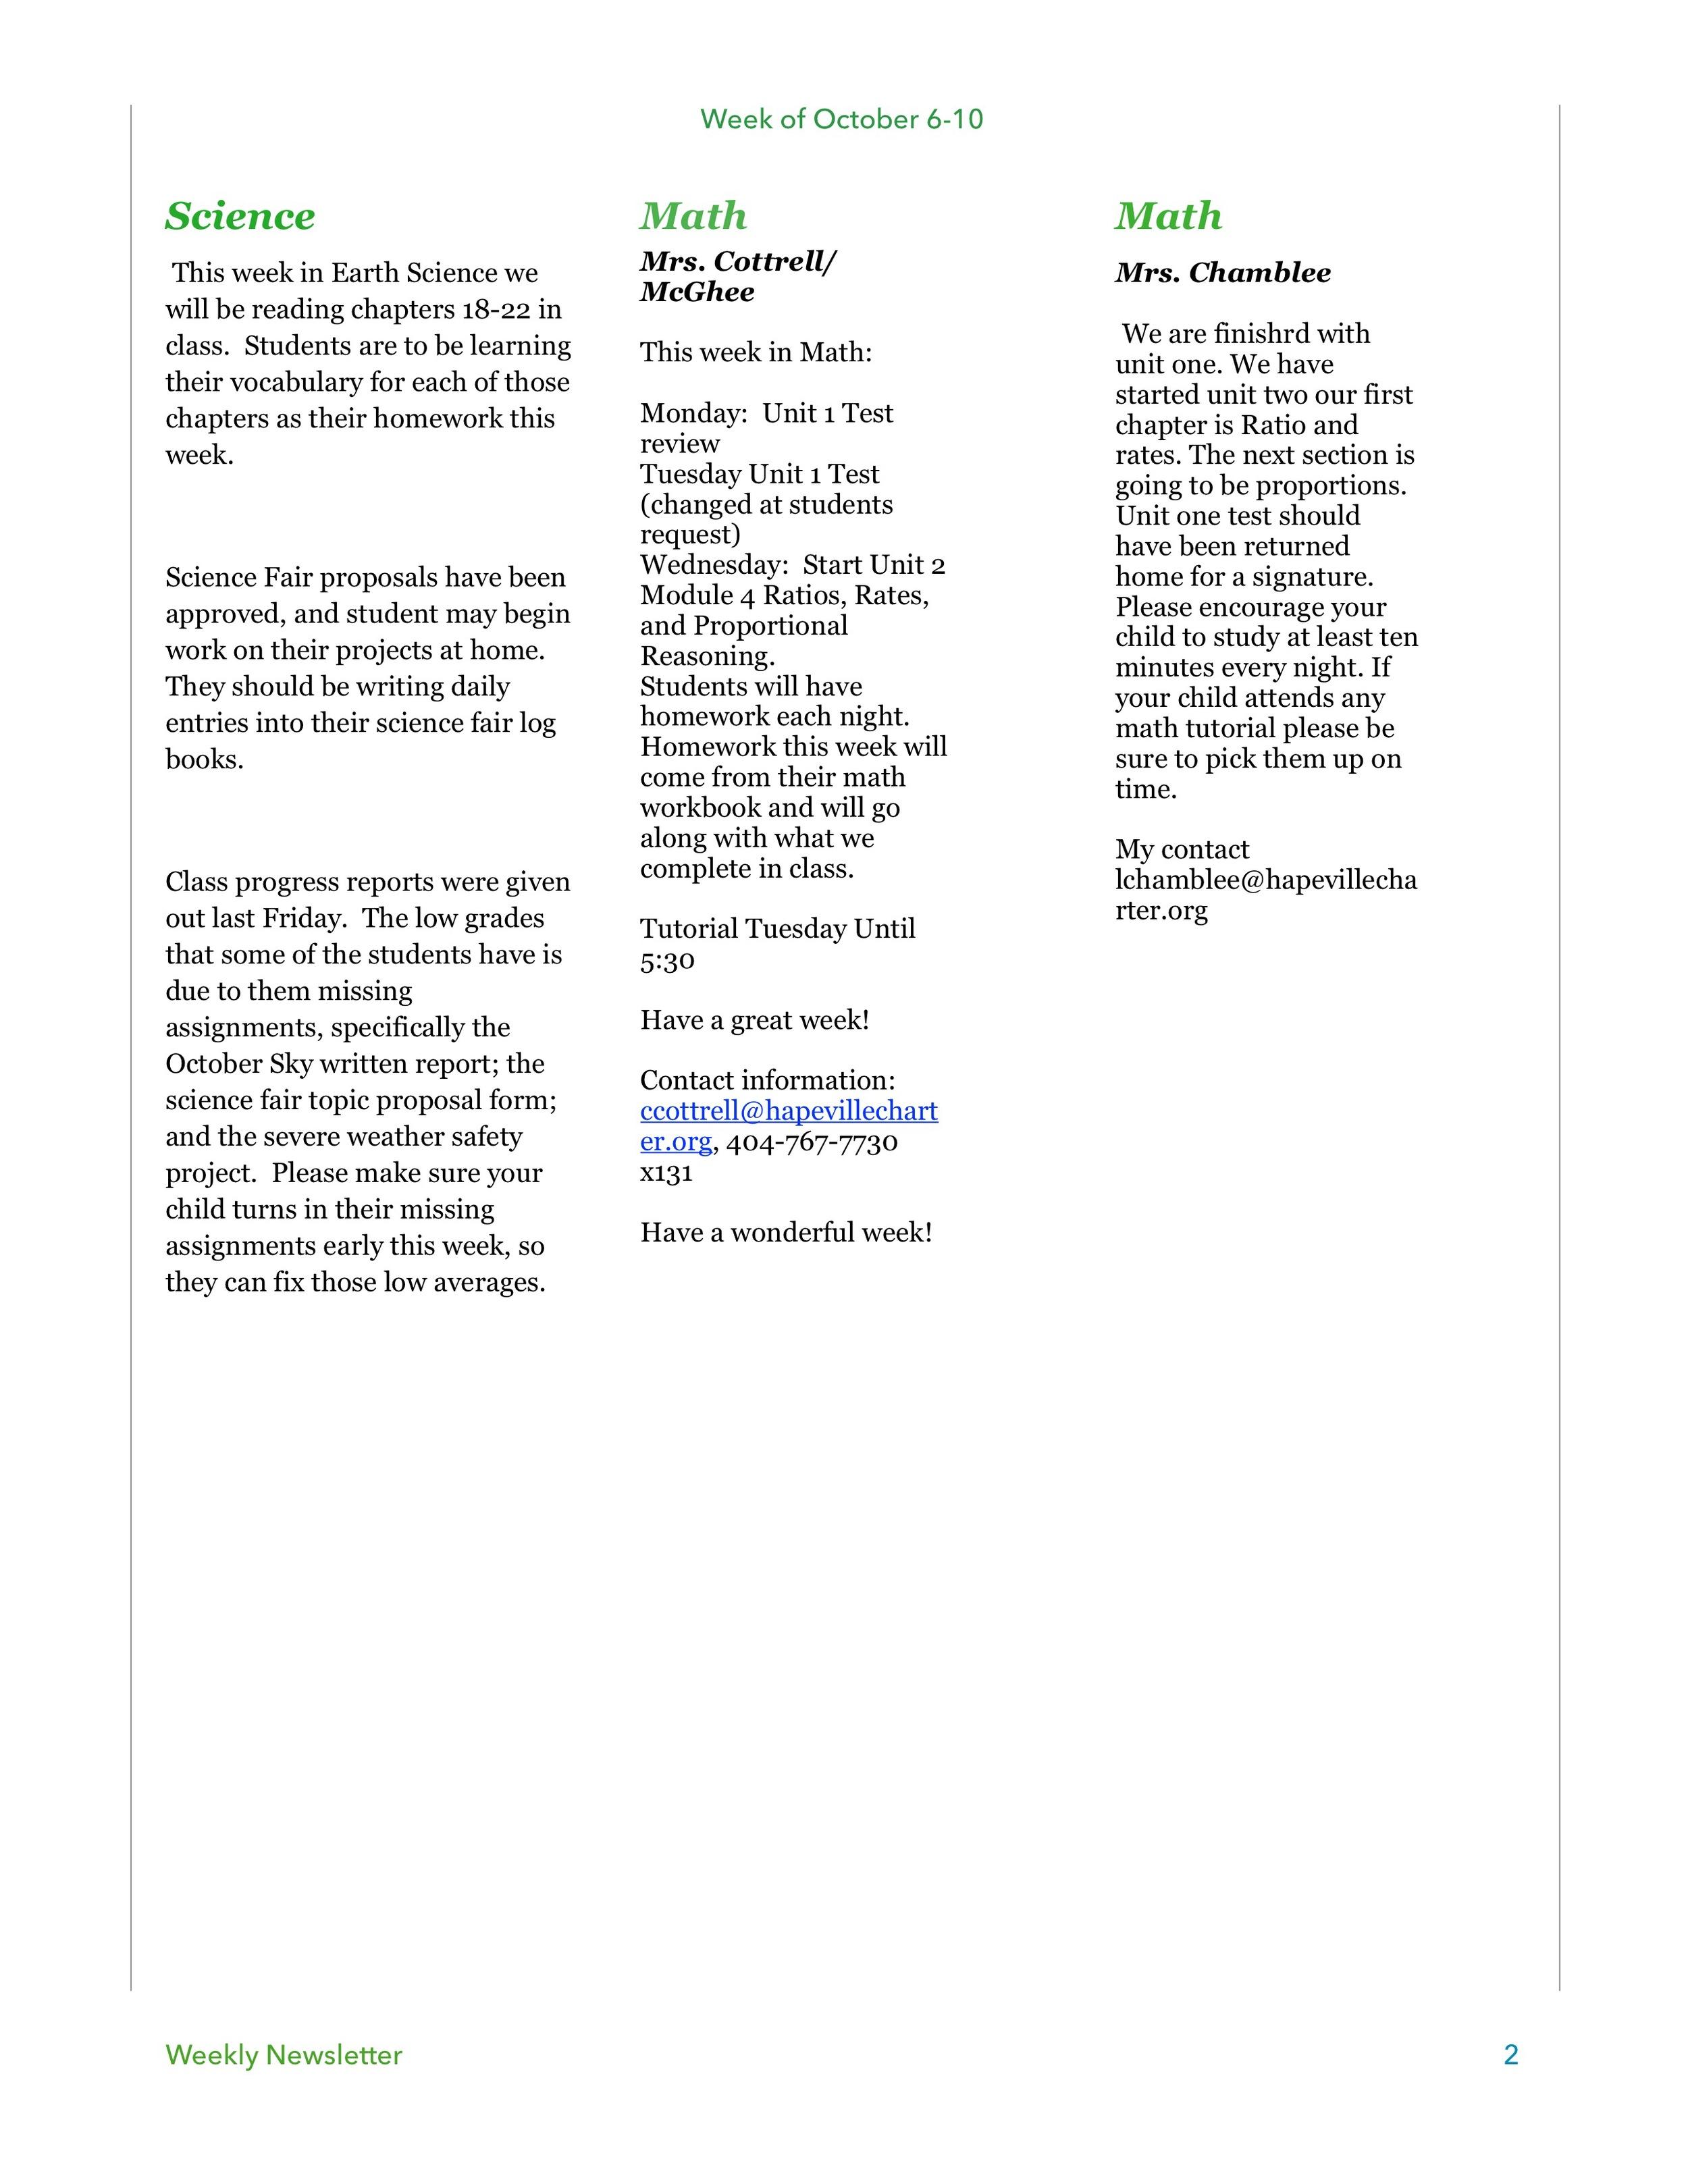 Newsletter Image6th grade October 6-10 2.jpeg